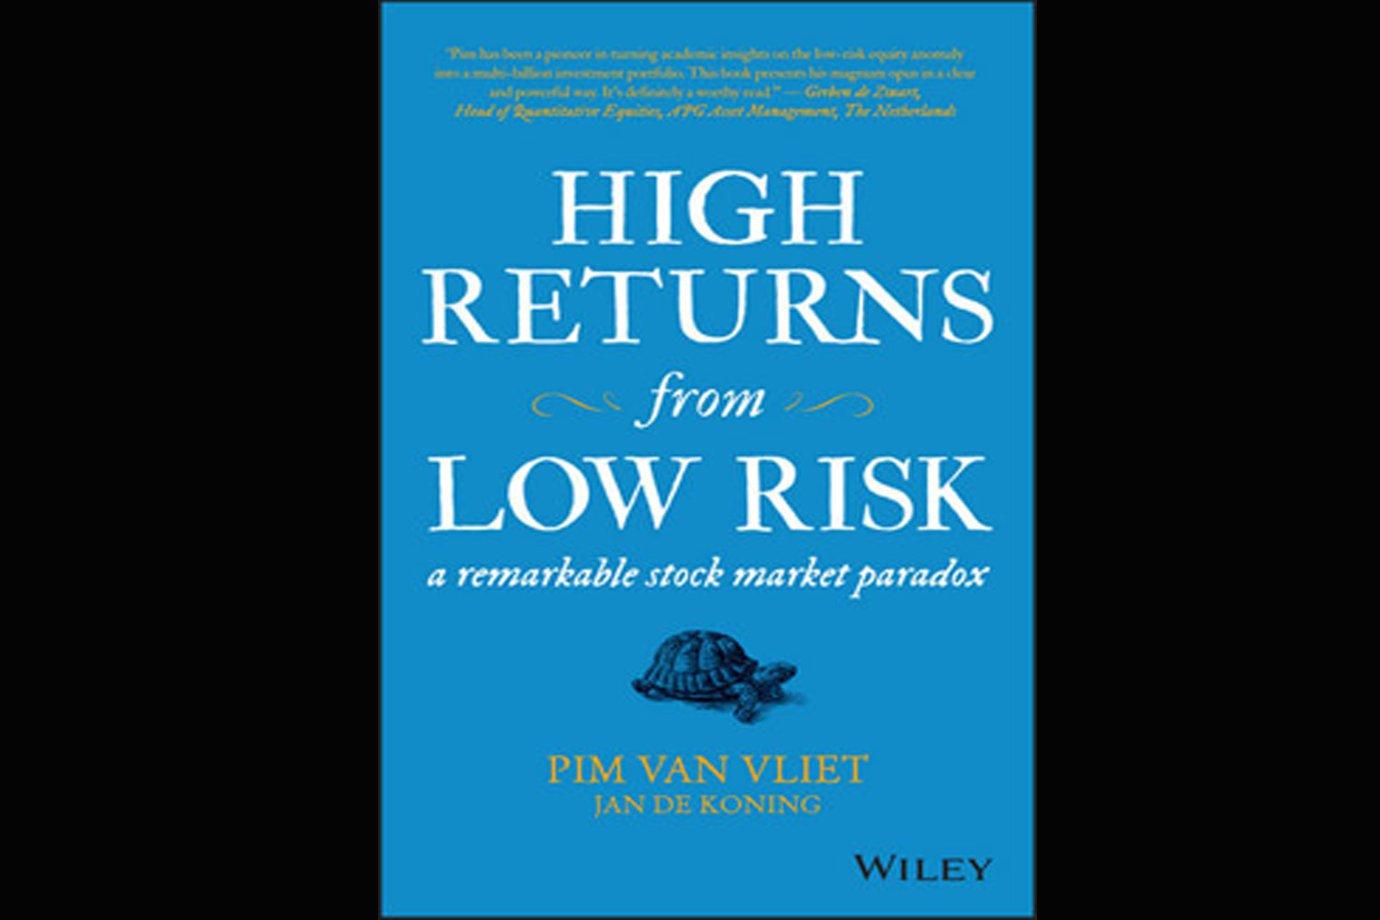 Livro High returns on low risks